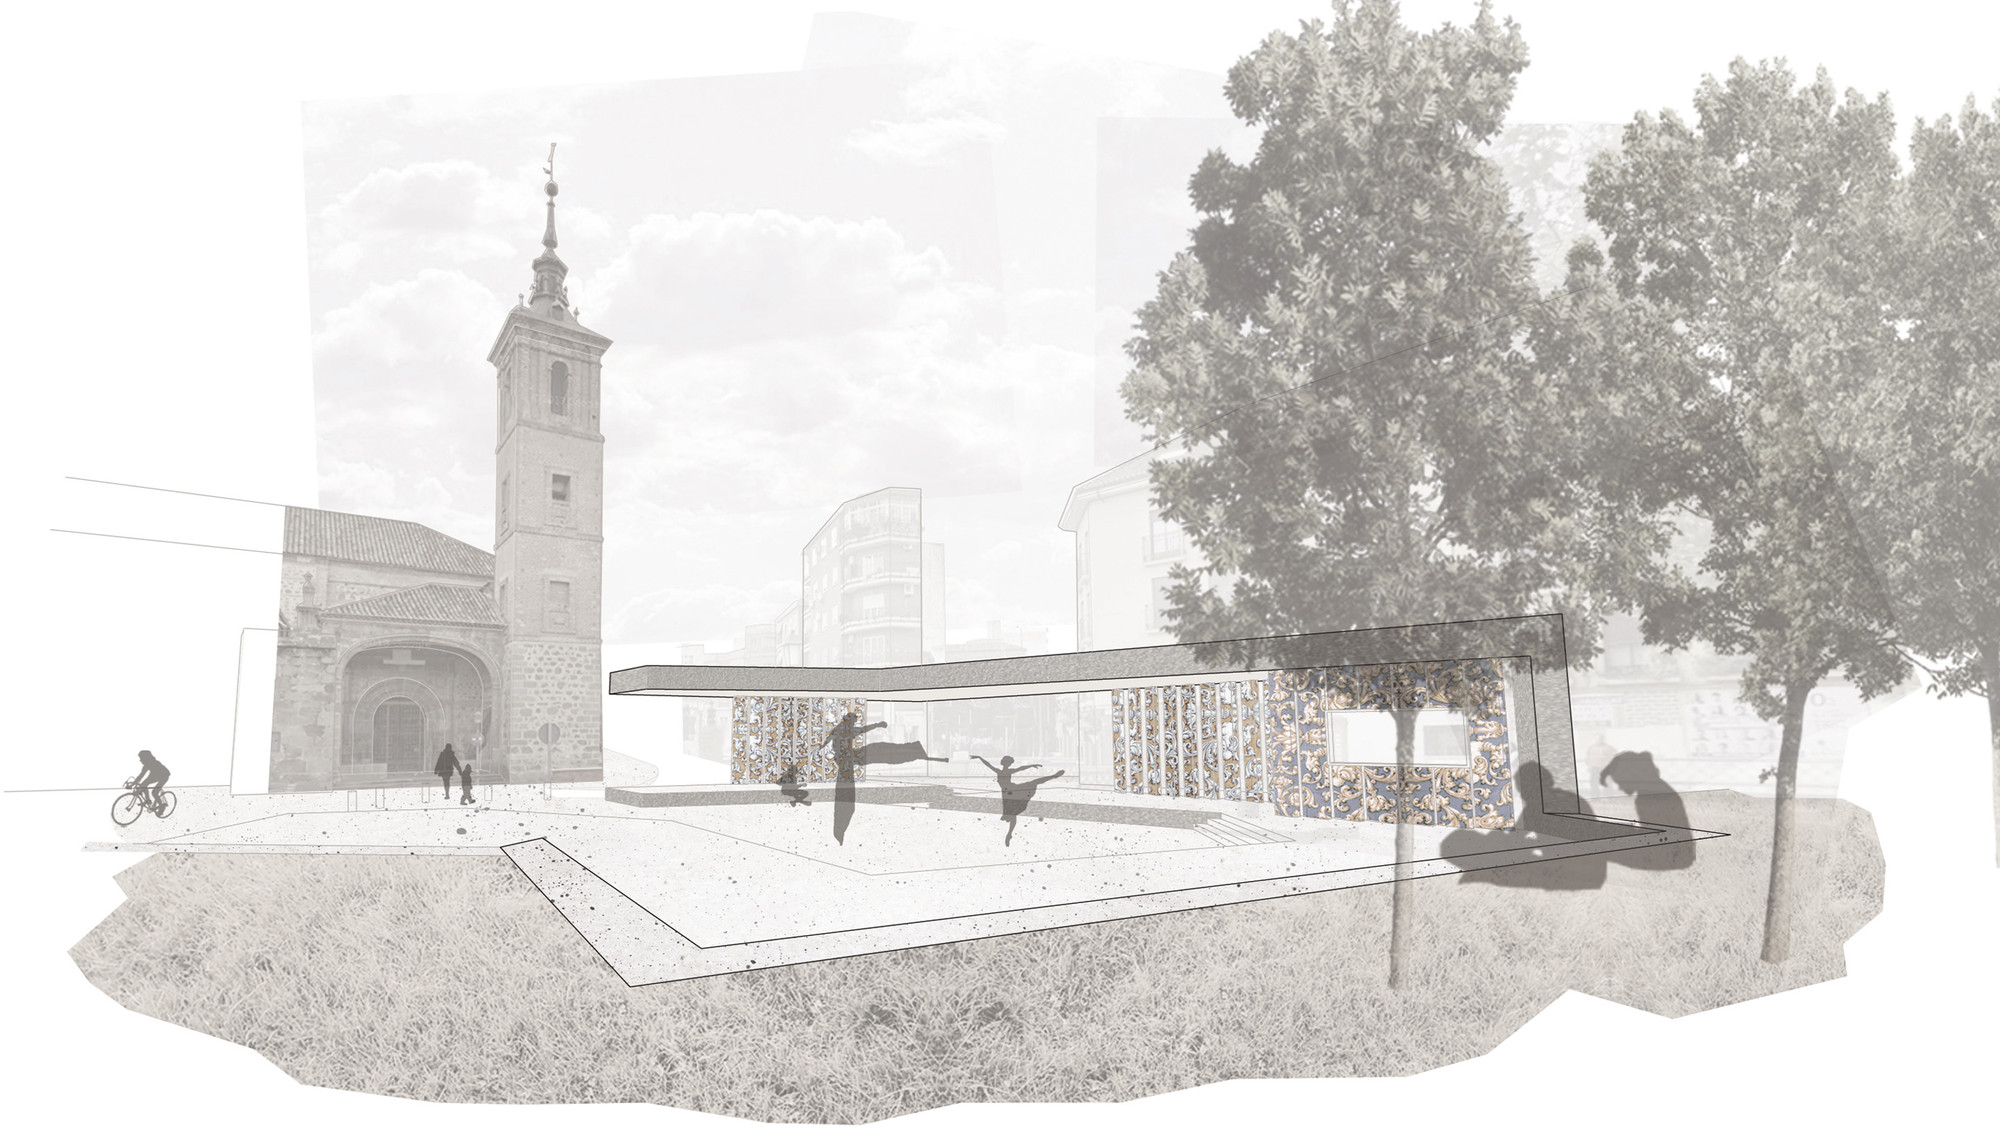 OOIIO Arquitectura, primer lugar en concurso de rehabilitación de Plaza del Salvador / España, Cortesia de OOIIO Arquitectura